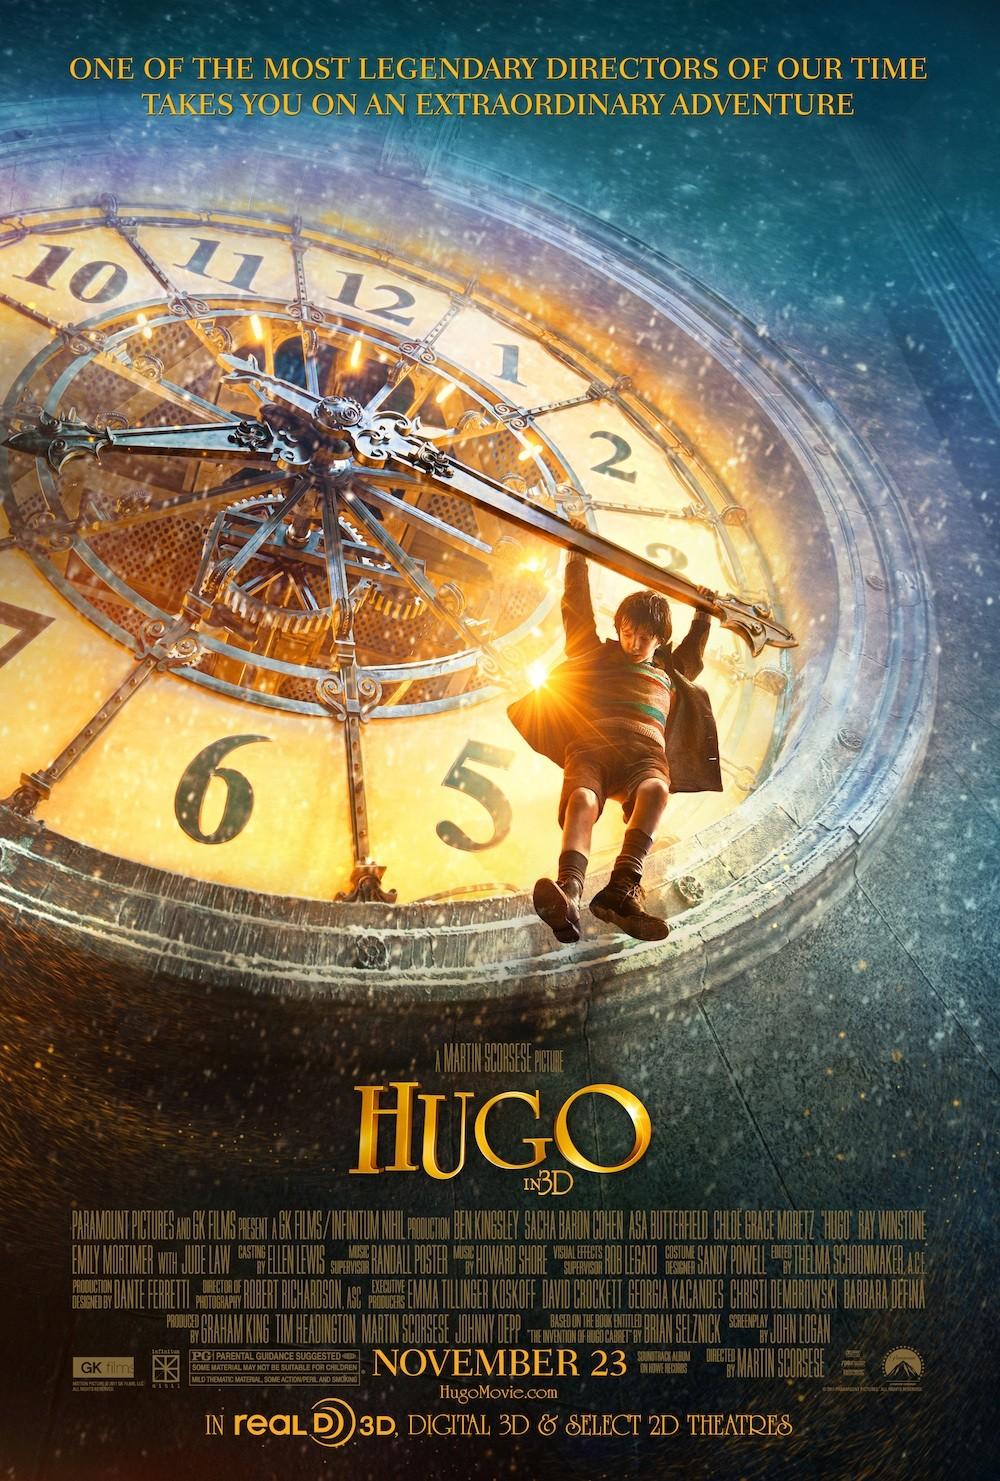 http://thirdcoastdigest.com/wp-content/uploads/2011/11/hugo-poster.jpg